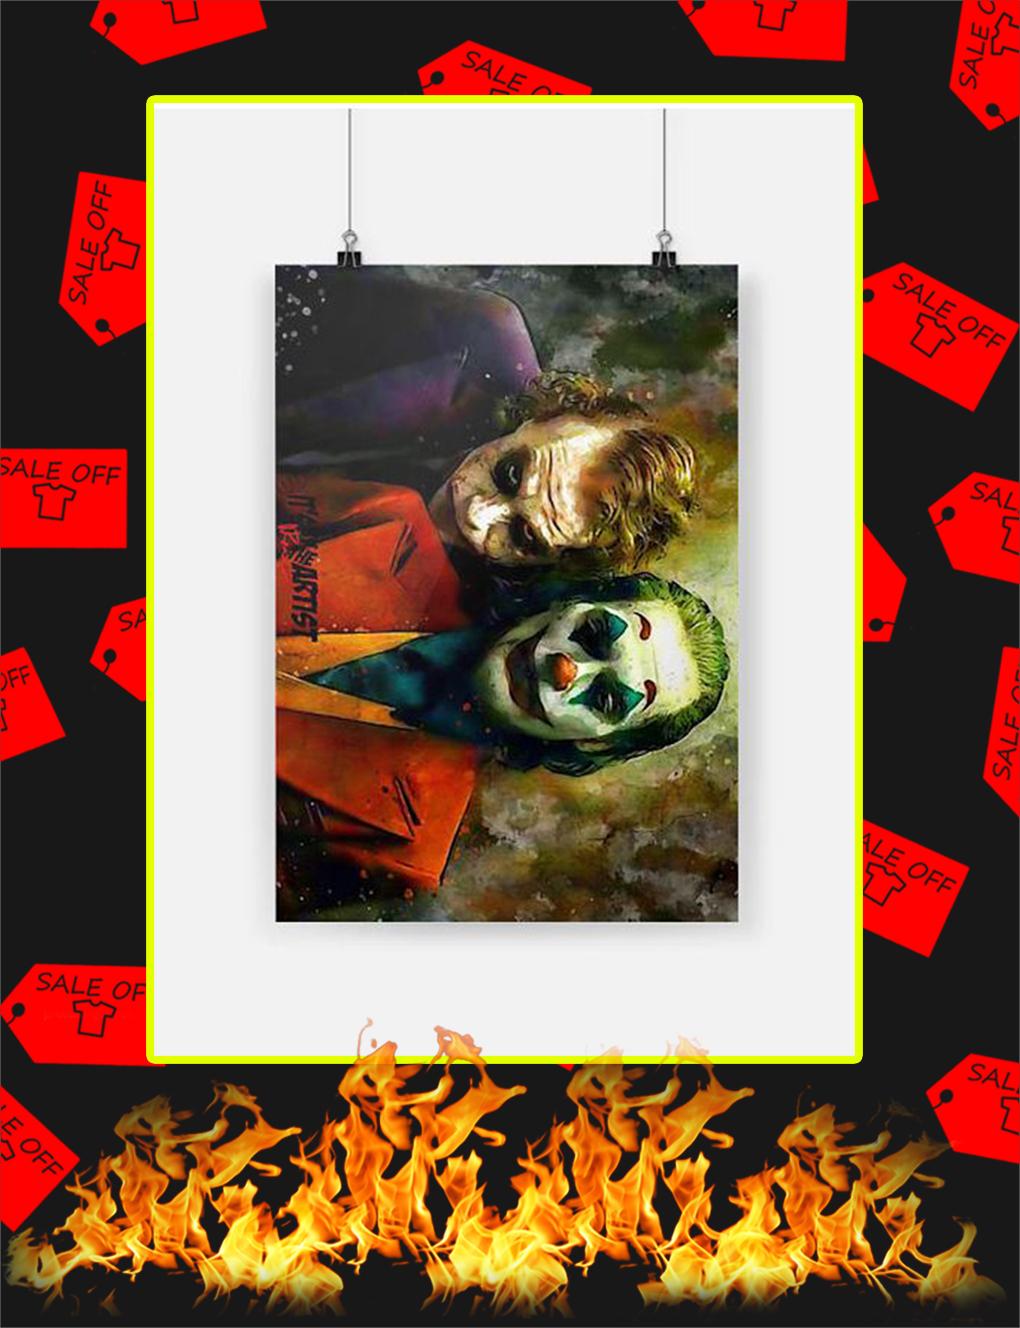 Joker Joaquin Phoenix and Heath Ledger Poster - A4